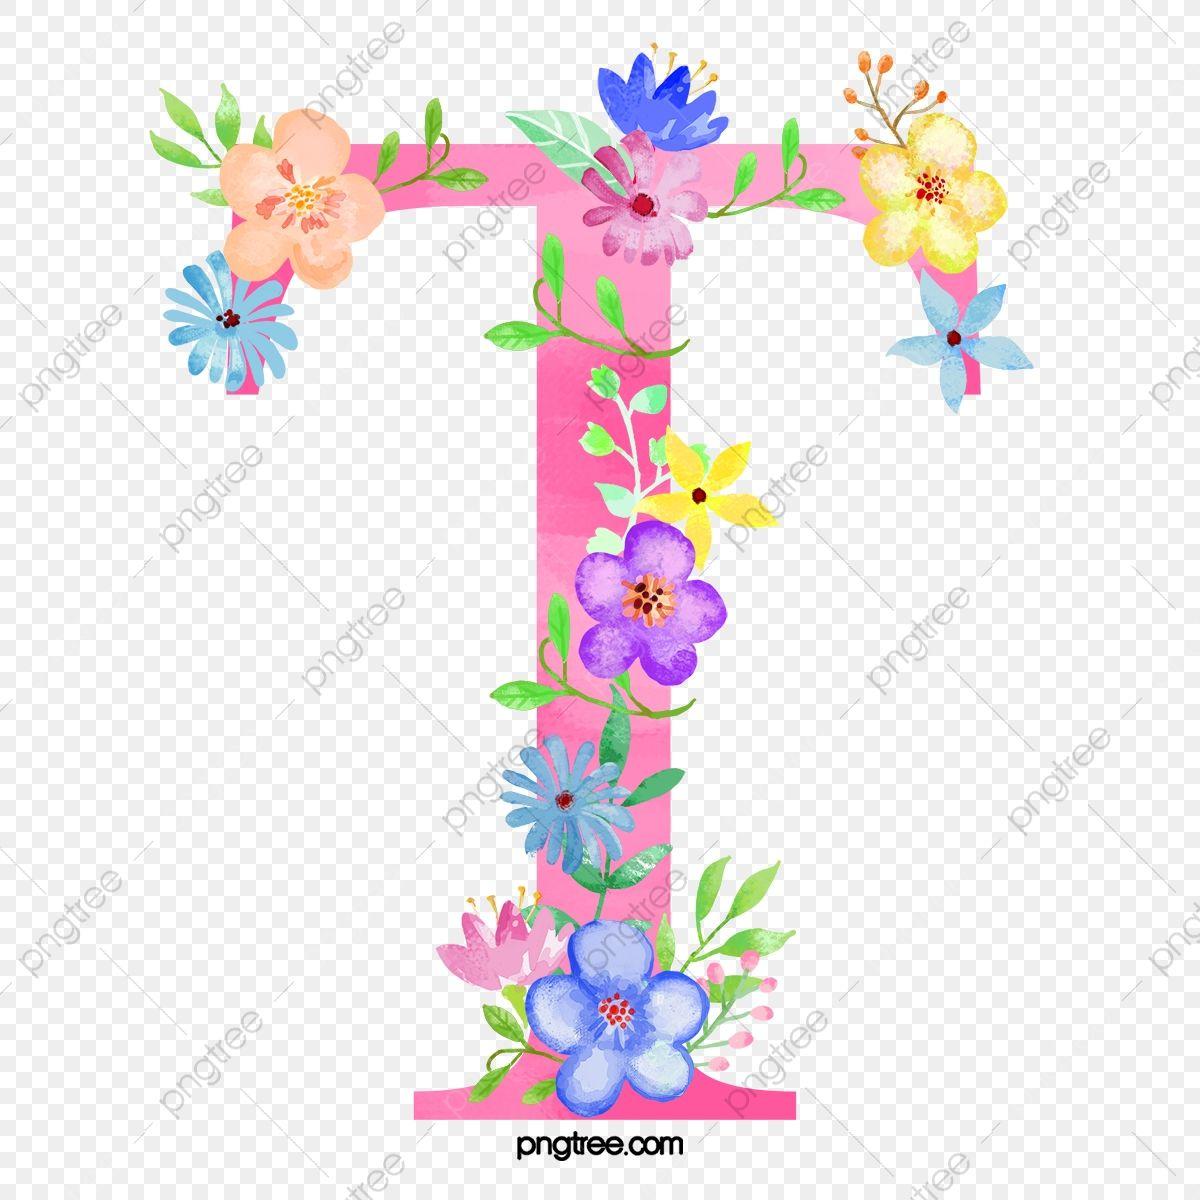 Flowers Letter T Letter Flower T Png Transparent Clipart Image And Psd File For Free Download Flower Illustration Watercolor Flower Background Flower Letters